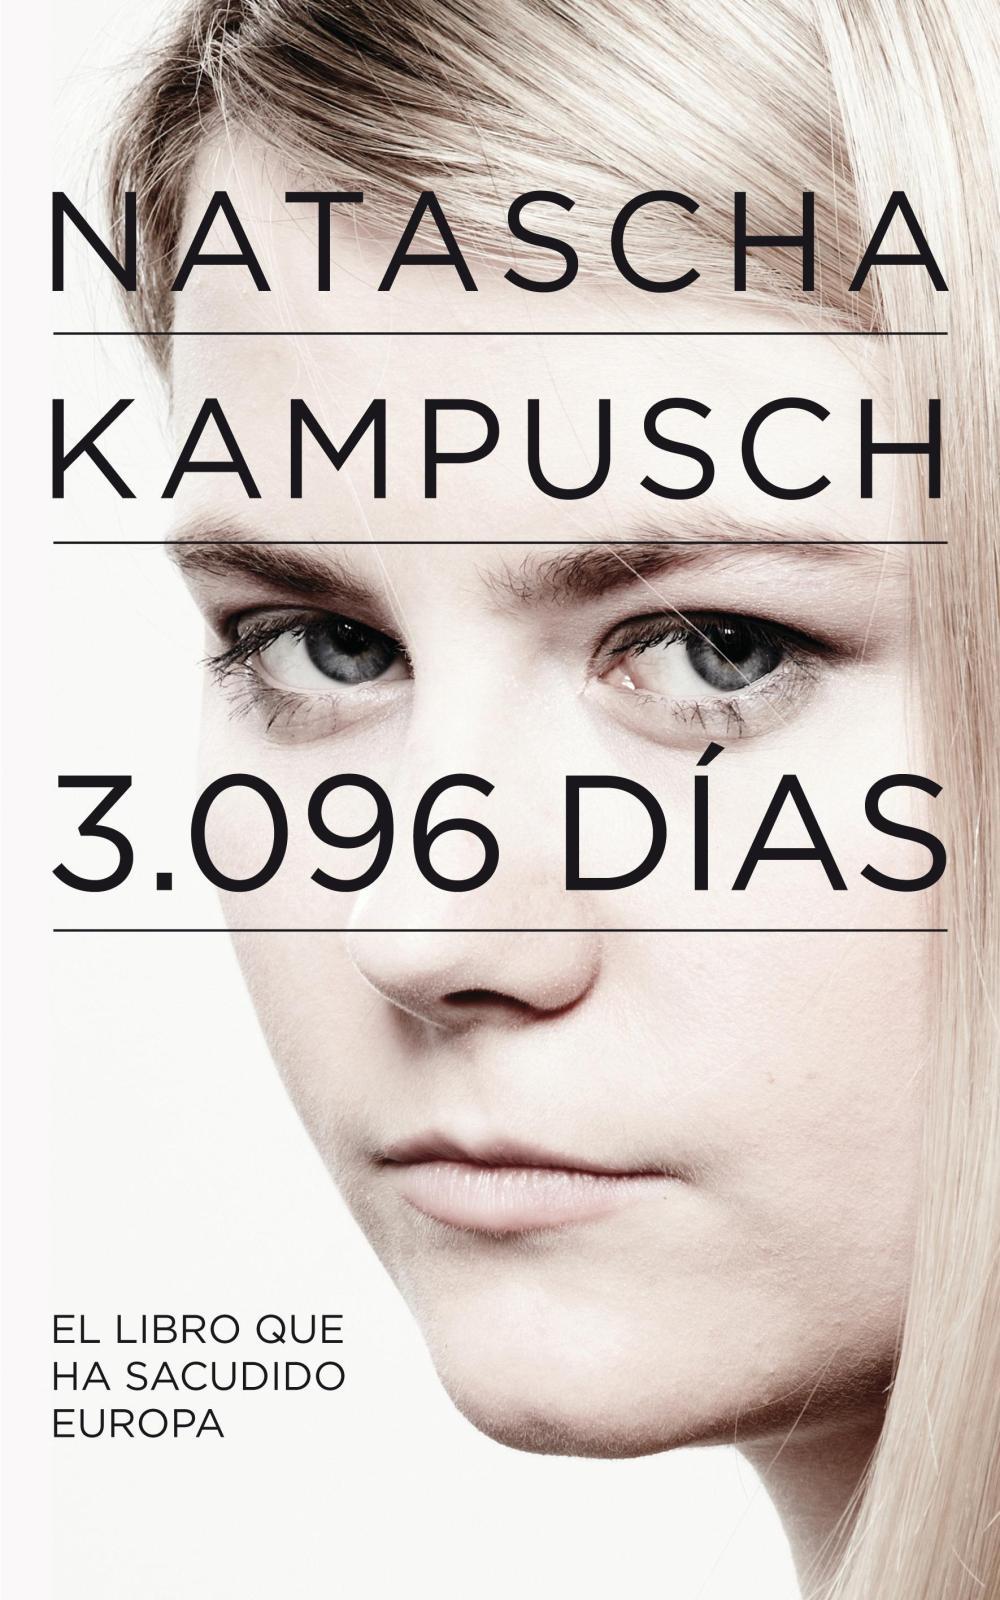 kAMPUSCH